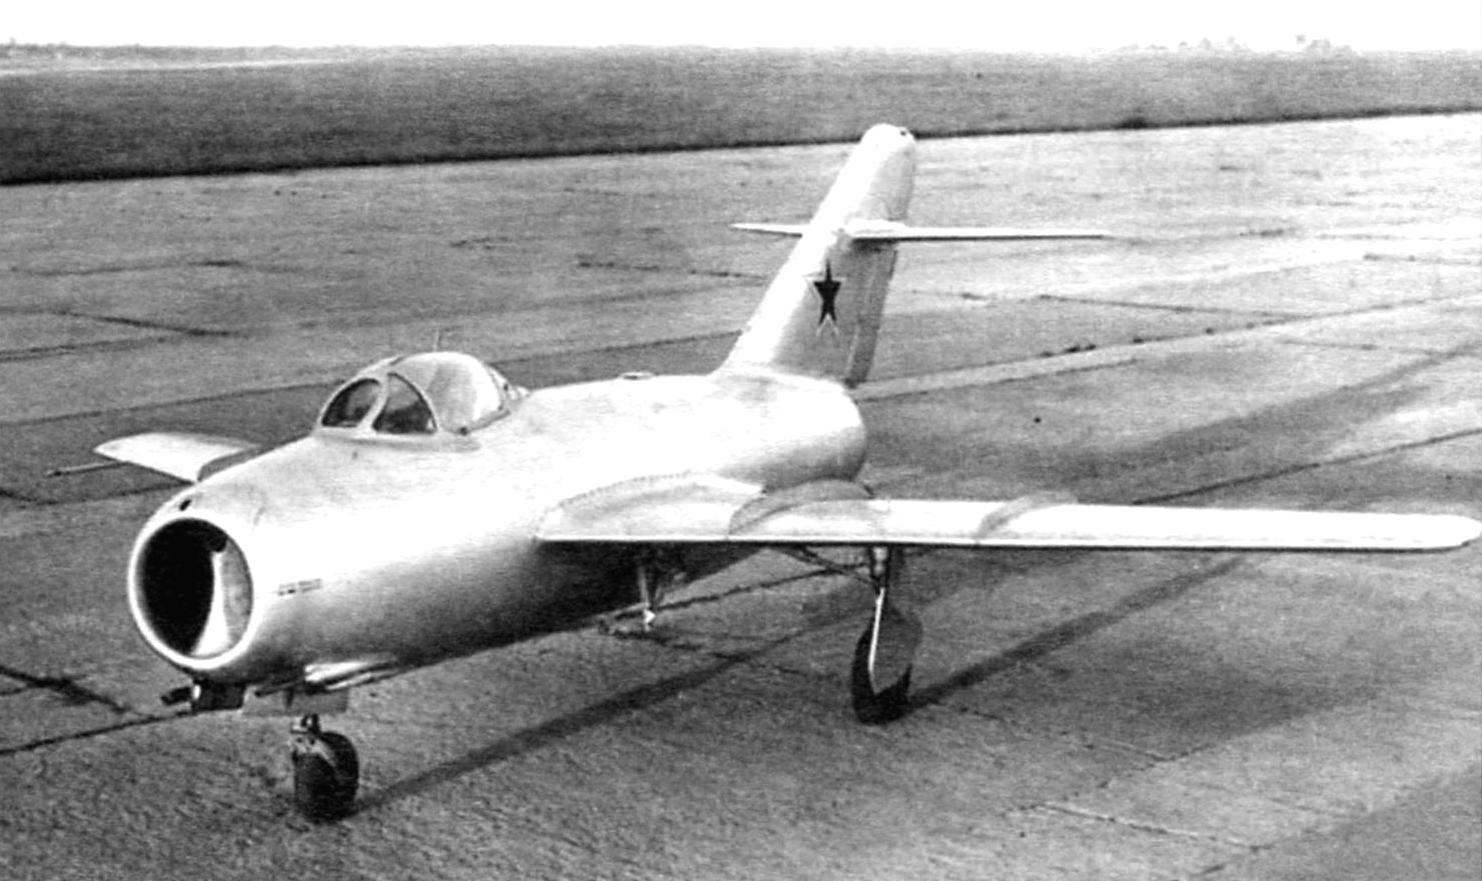 Прототип МиГ-15 перед полётом